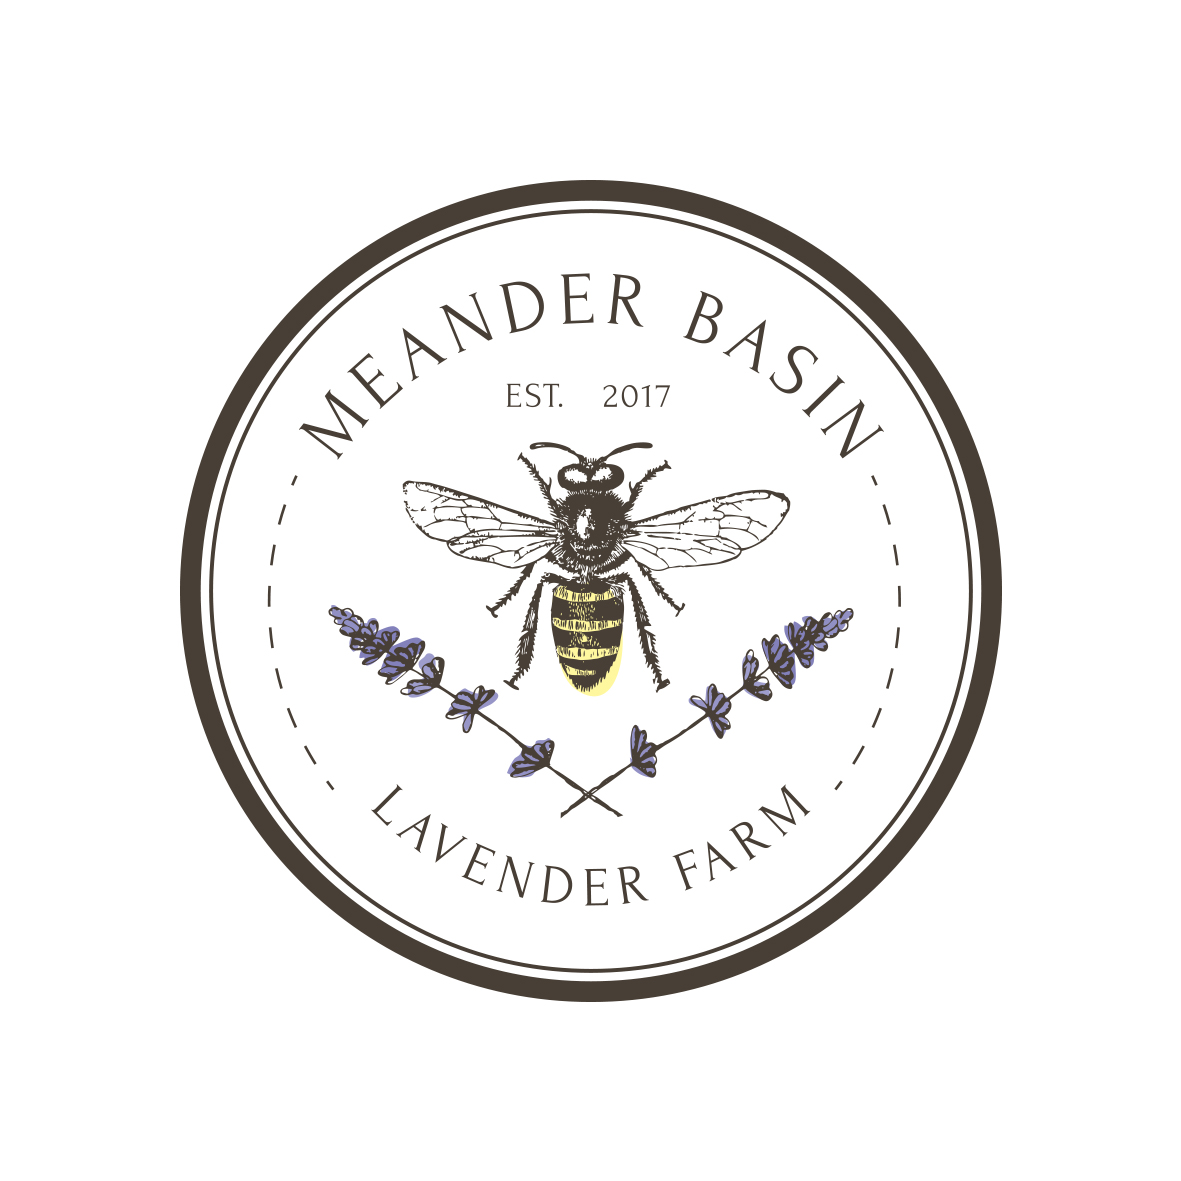 Meander Basin Lavender Farm Logo Design by Billie Hardy Creative